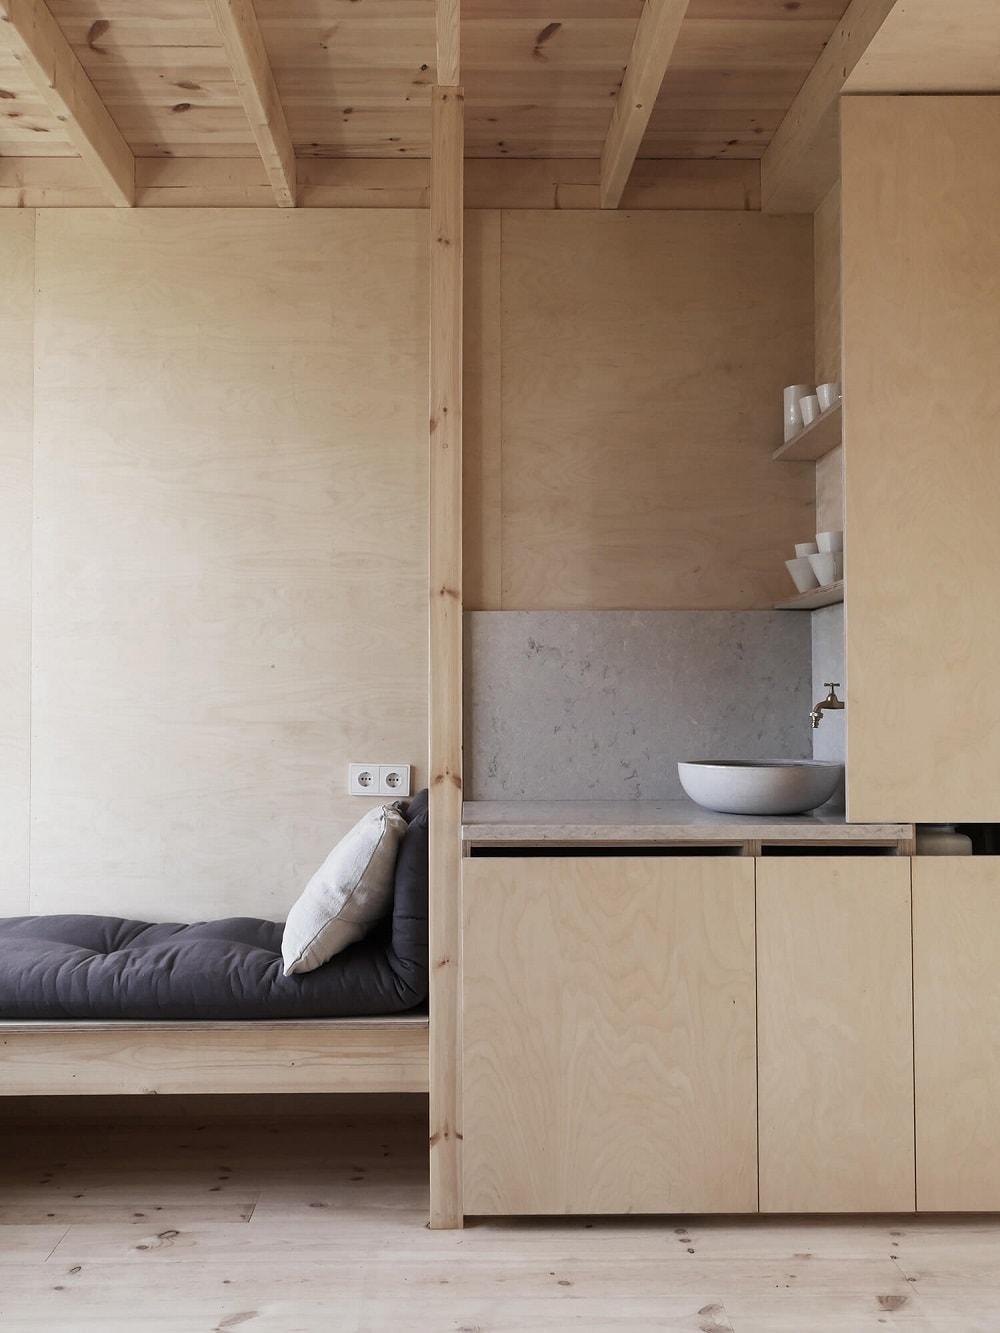 Bergaliv Landscape Hotel - The Loft House, Sweden - Architect Hanna Michelson